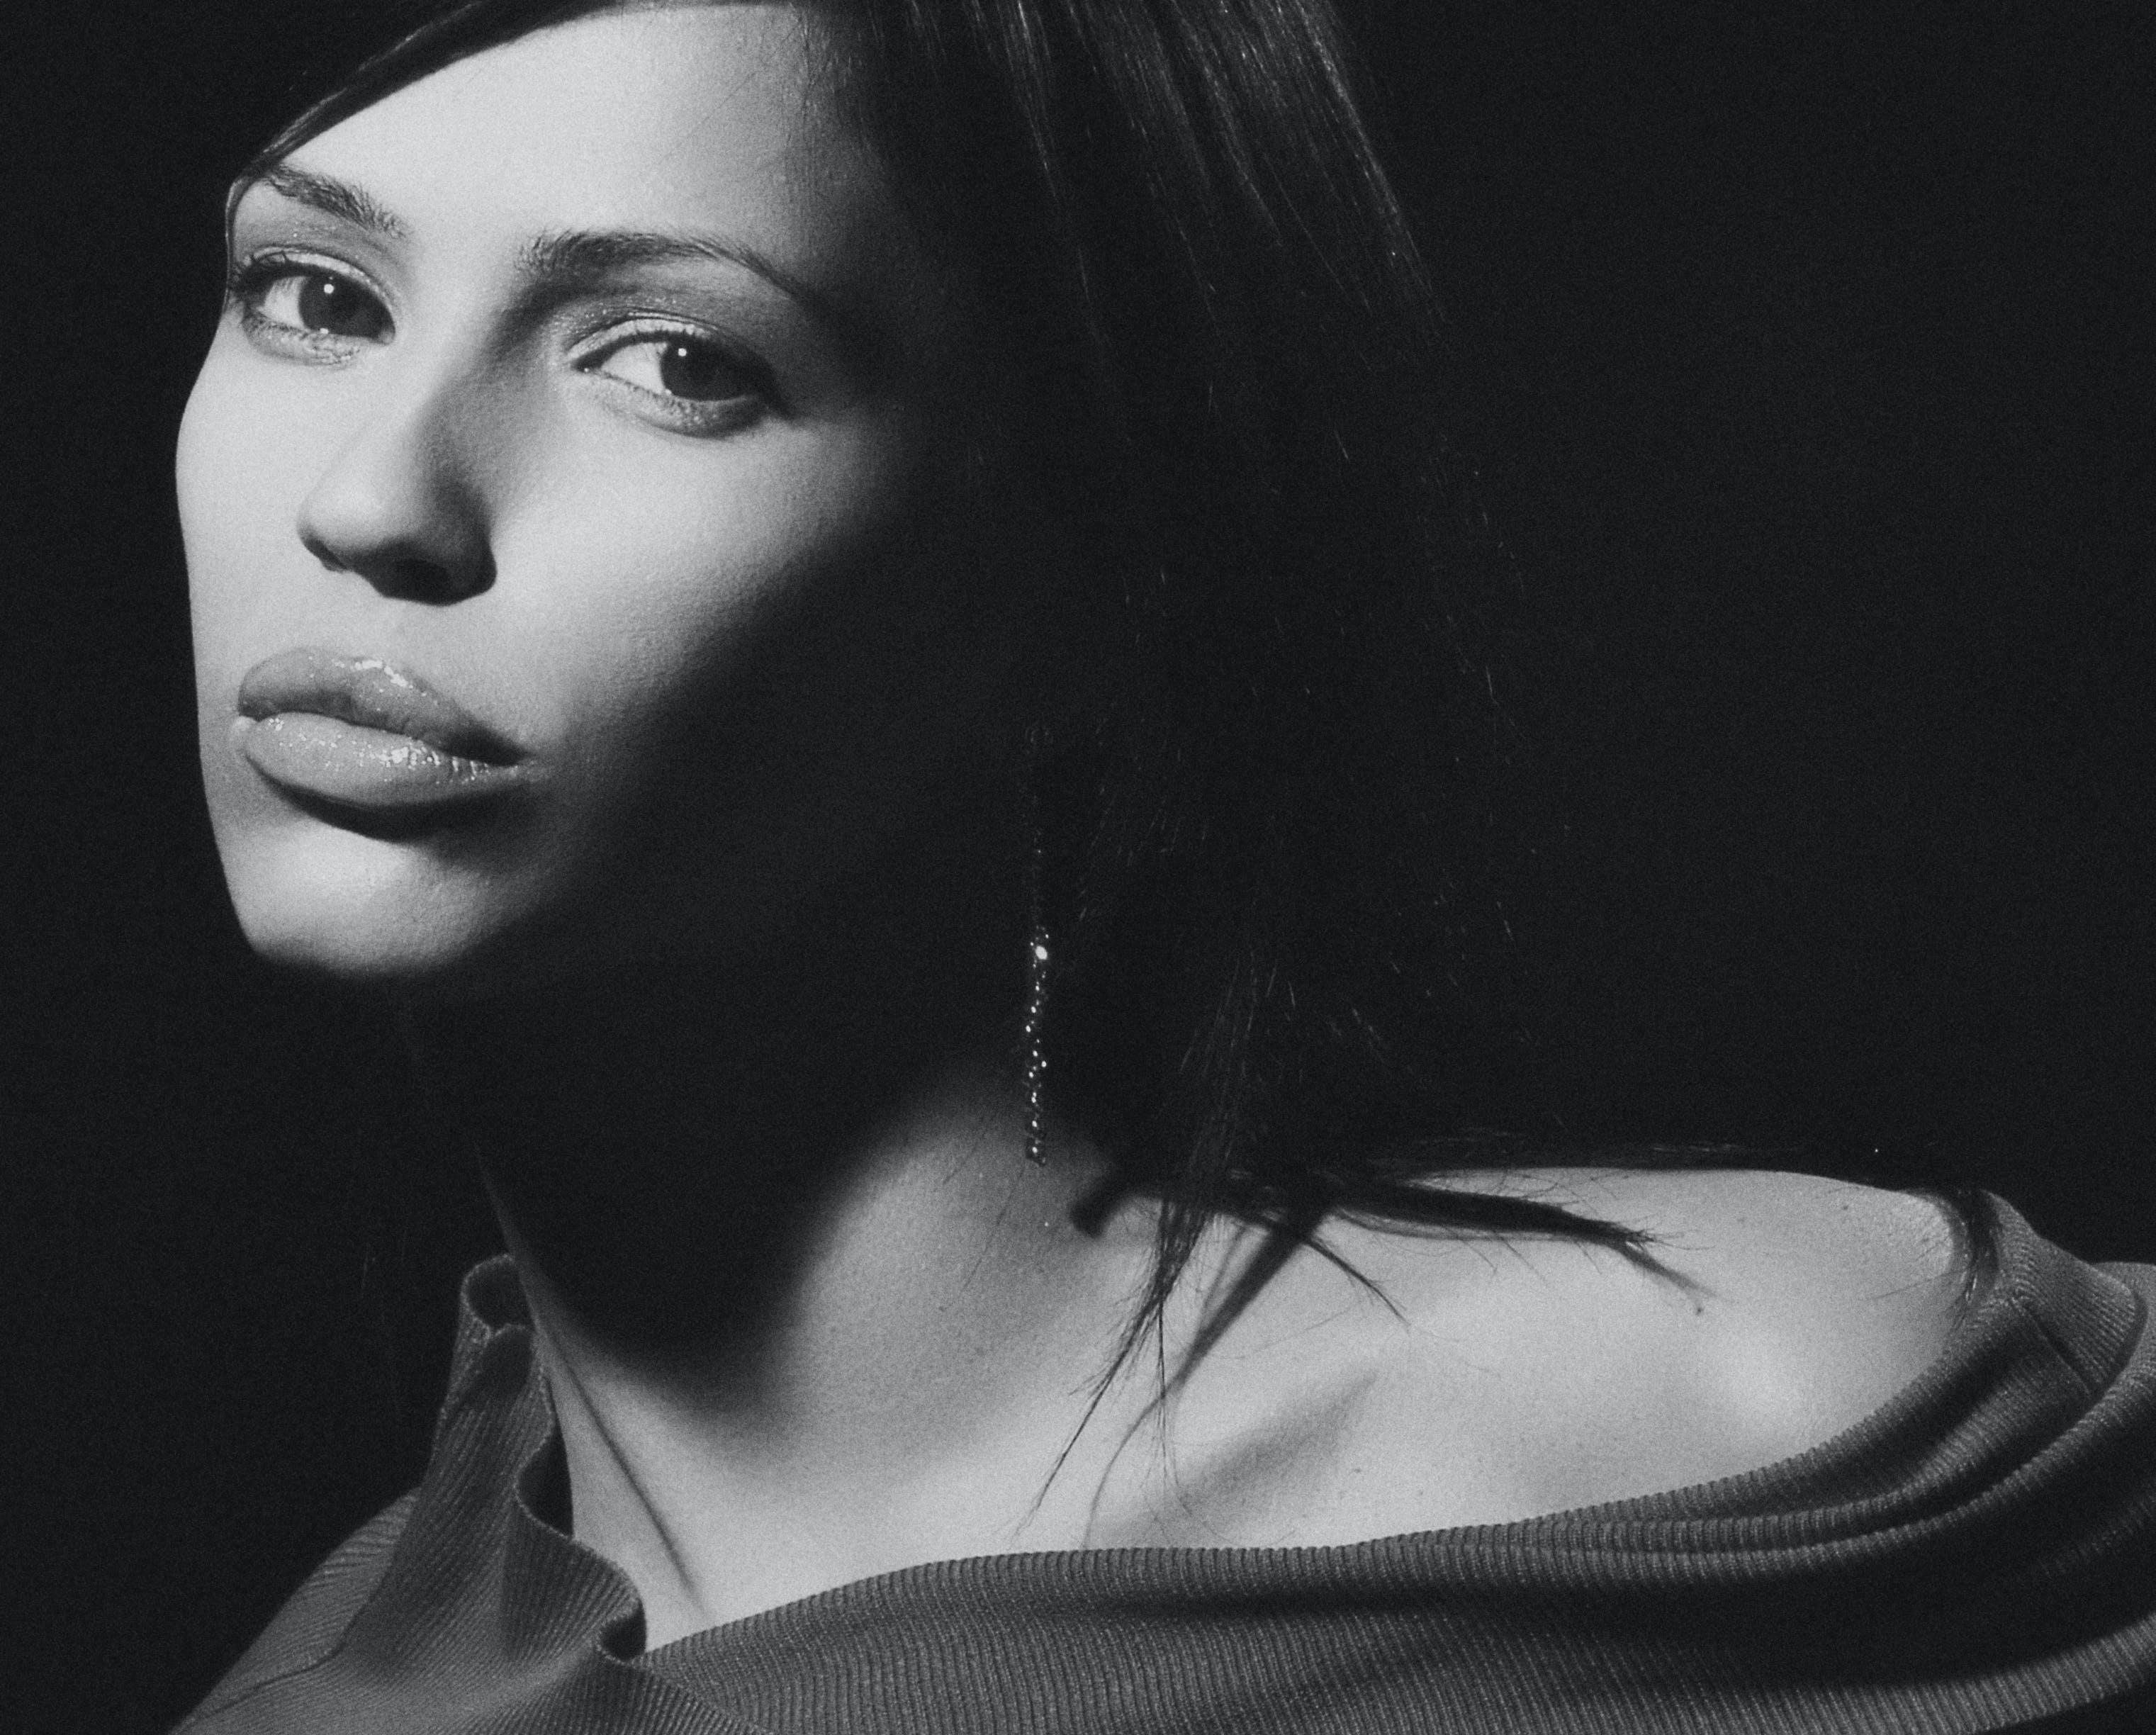 Free stock photo of girl, portrait, studio, black and white